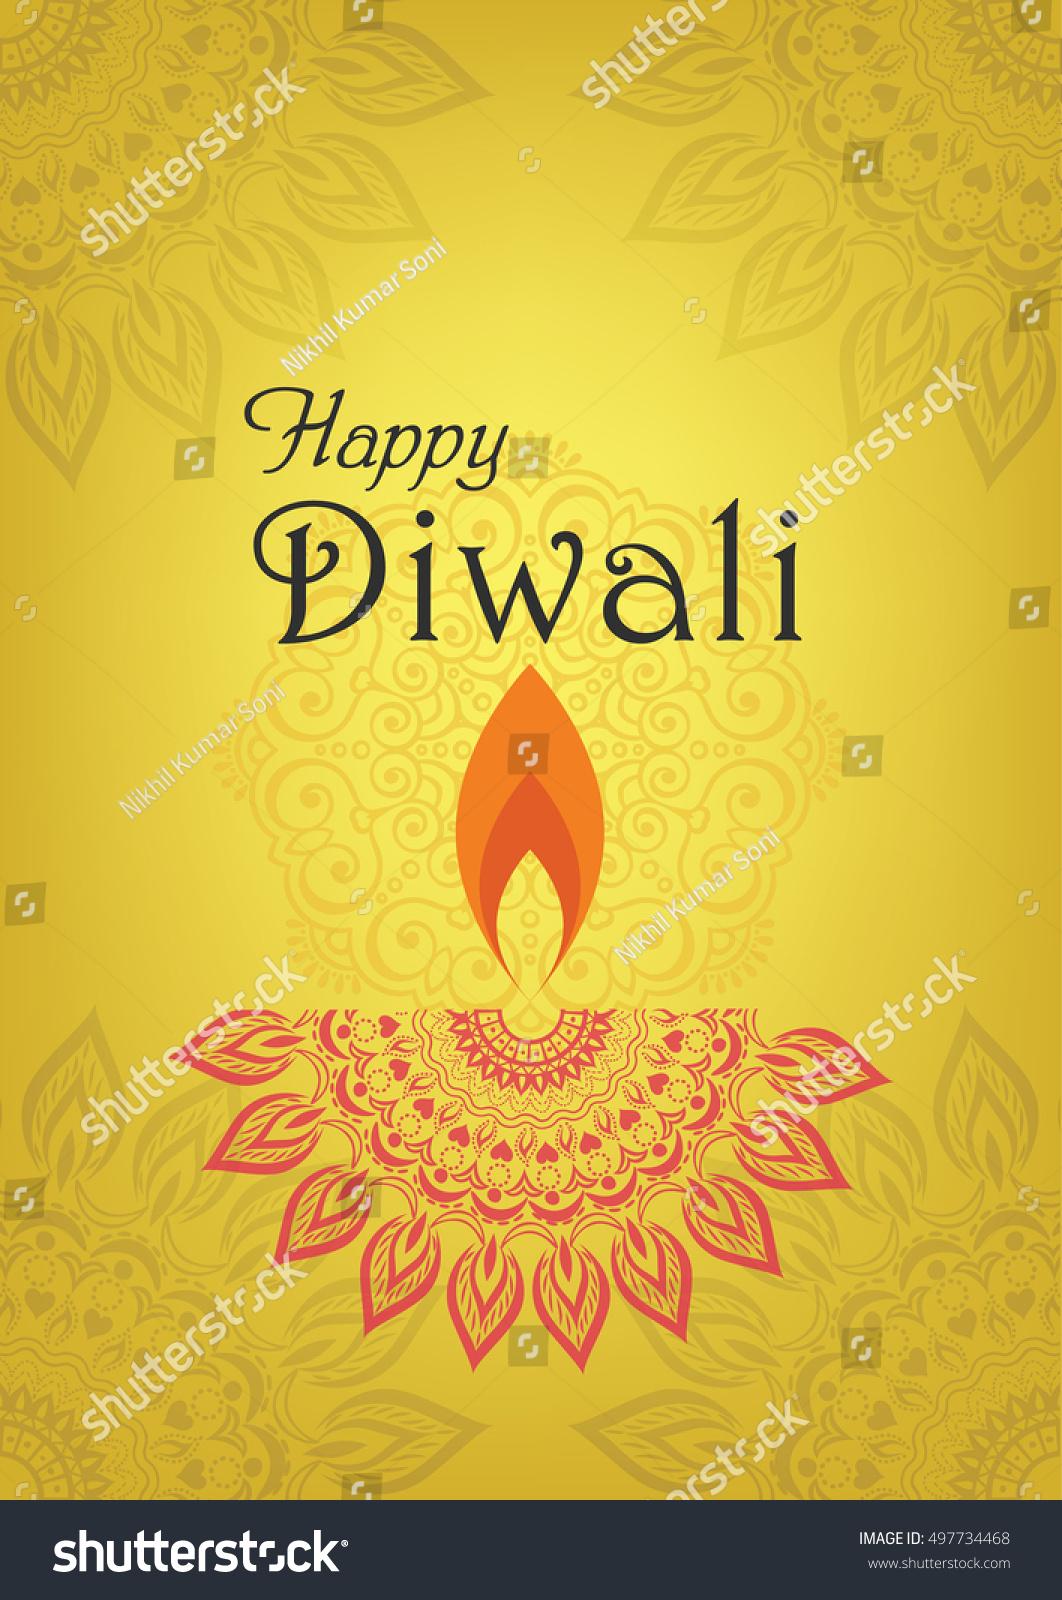 Diwali greeting design for Diwali festival celebration in India